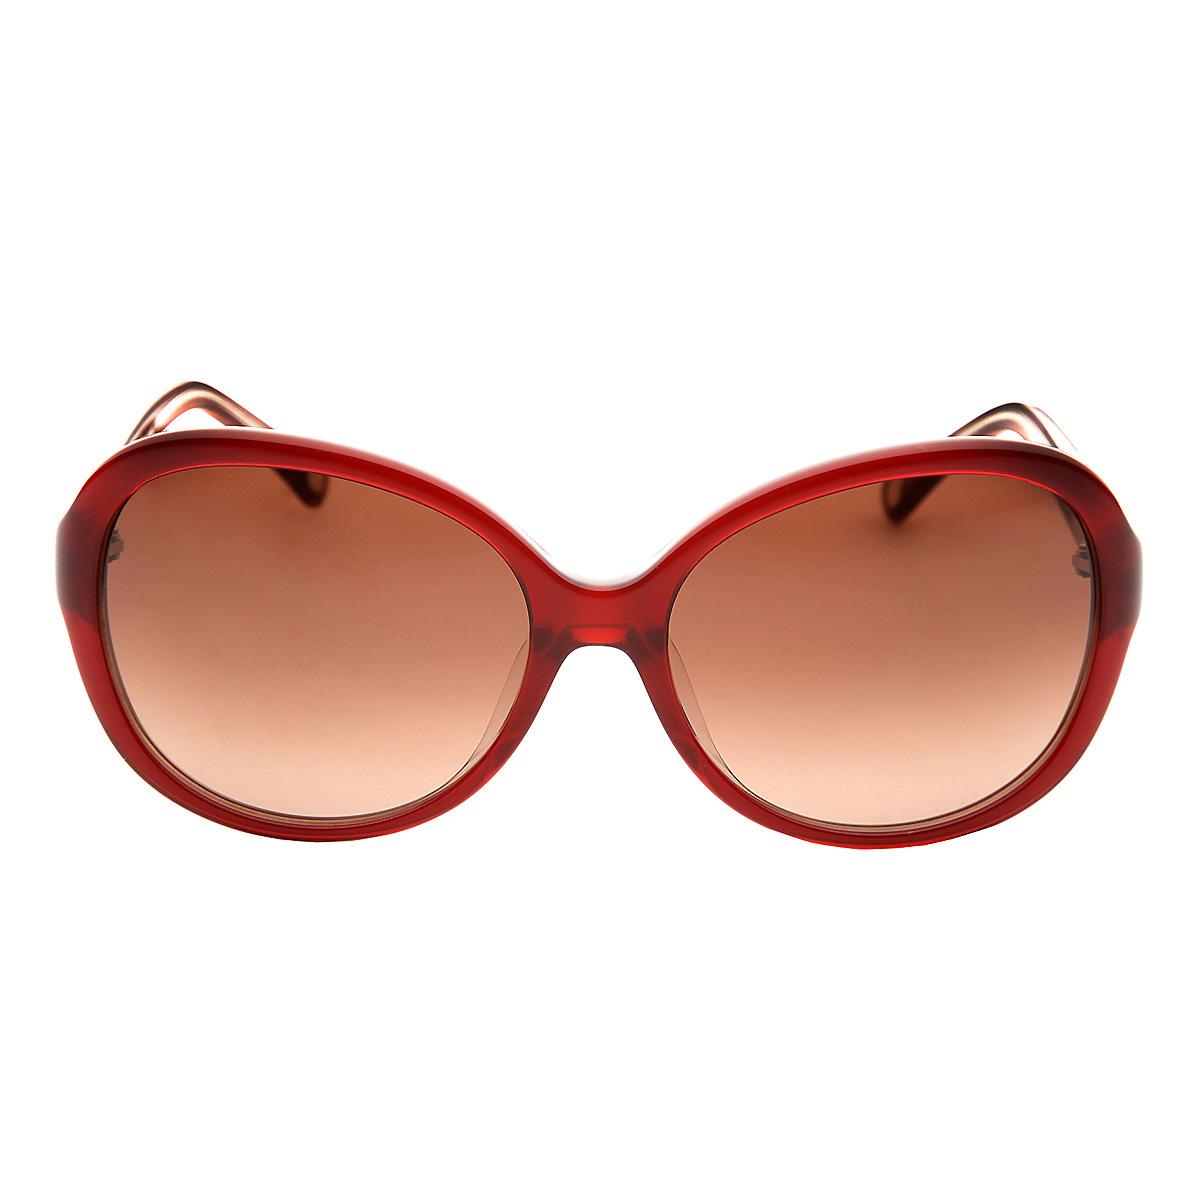 michael kors sonnenbrille mks299 604 damen jennah ladys sunglasses rot neu ovp. Black Bedroom Furniture Sets. Home Design Ideas